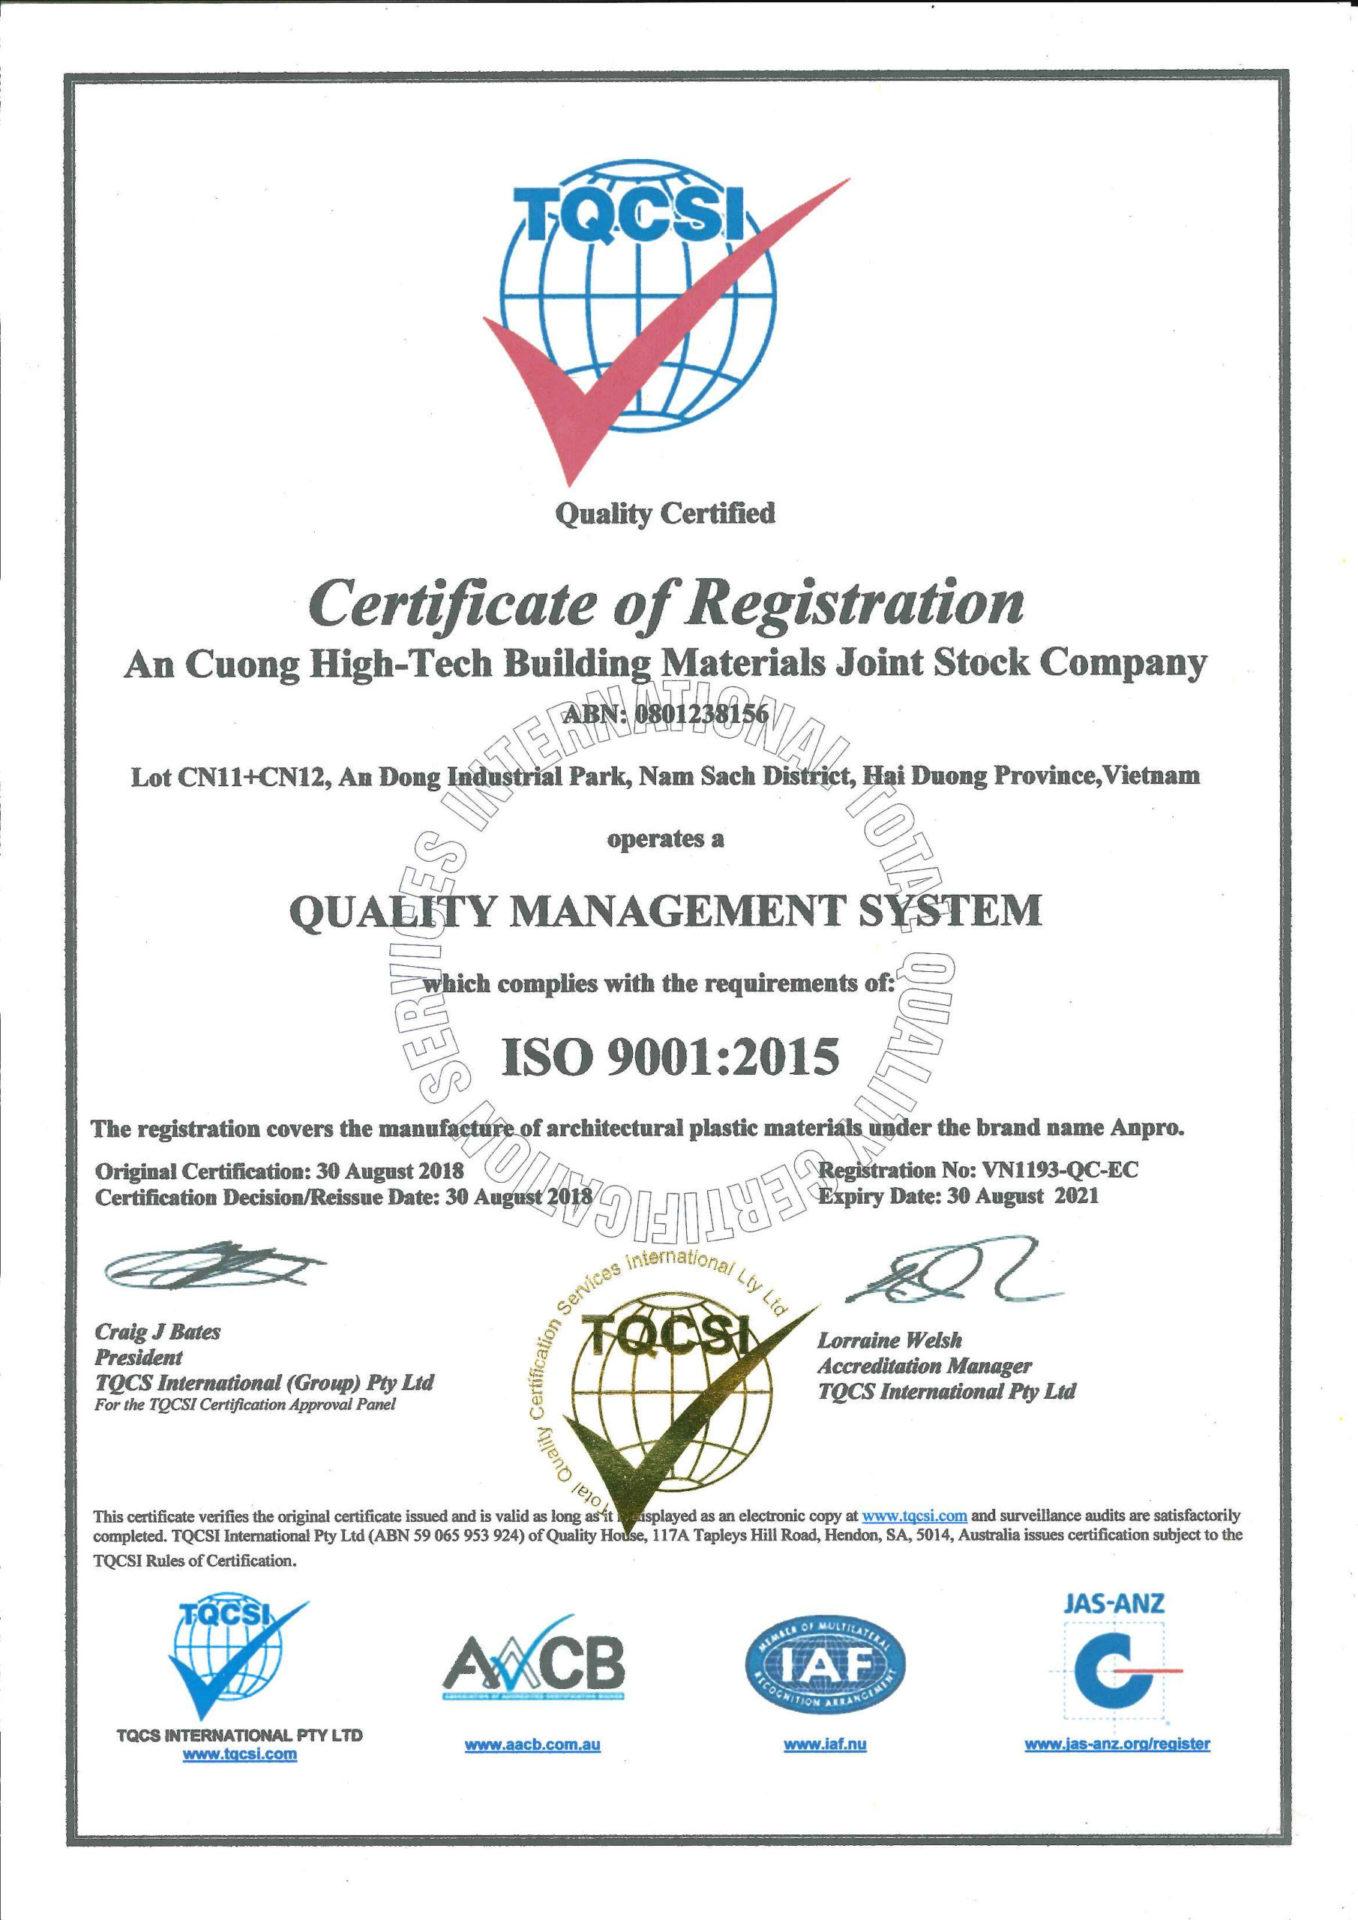 Nhà Máy ISO 9001 2015 Quality Management scaled e1588906982492 - QUALITY CONTROL